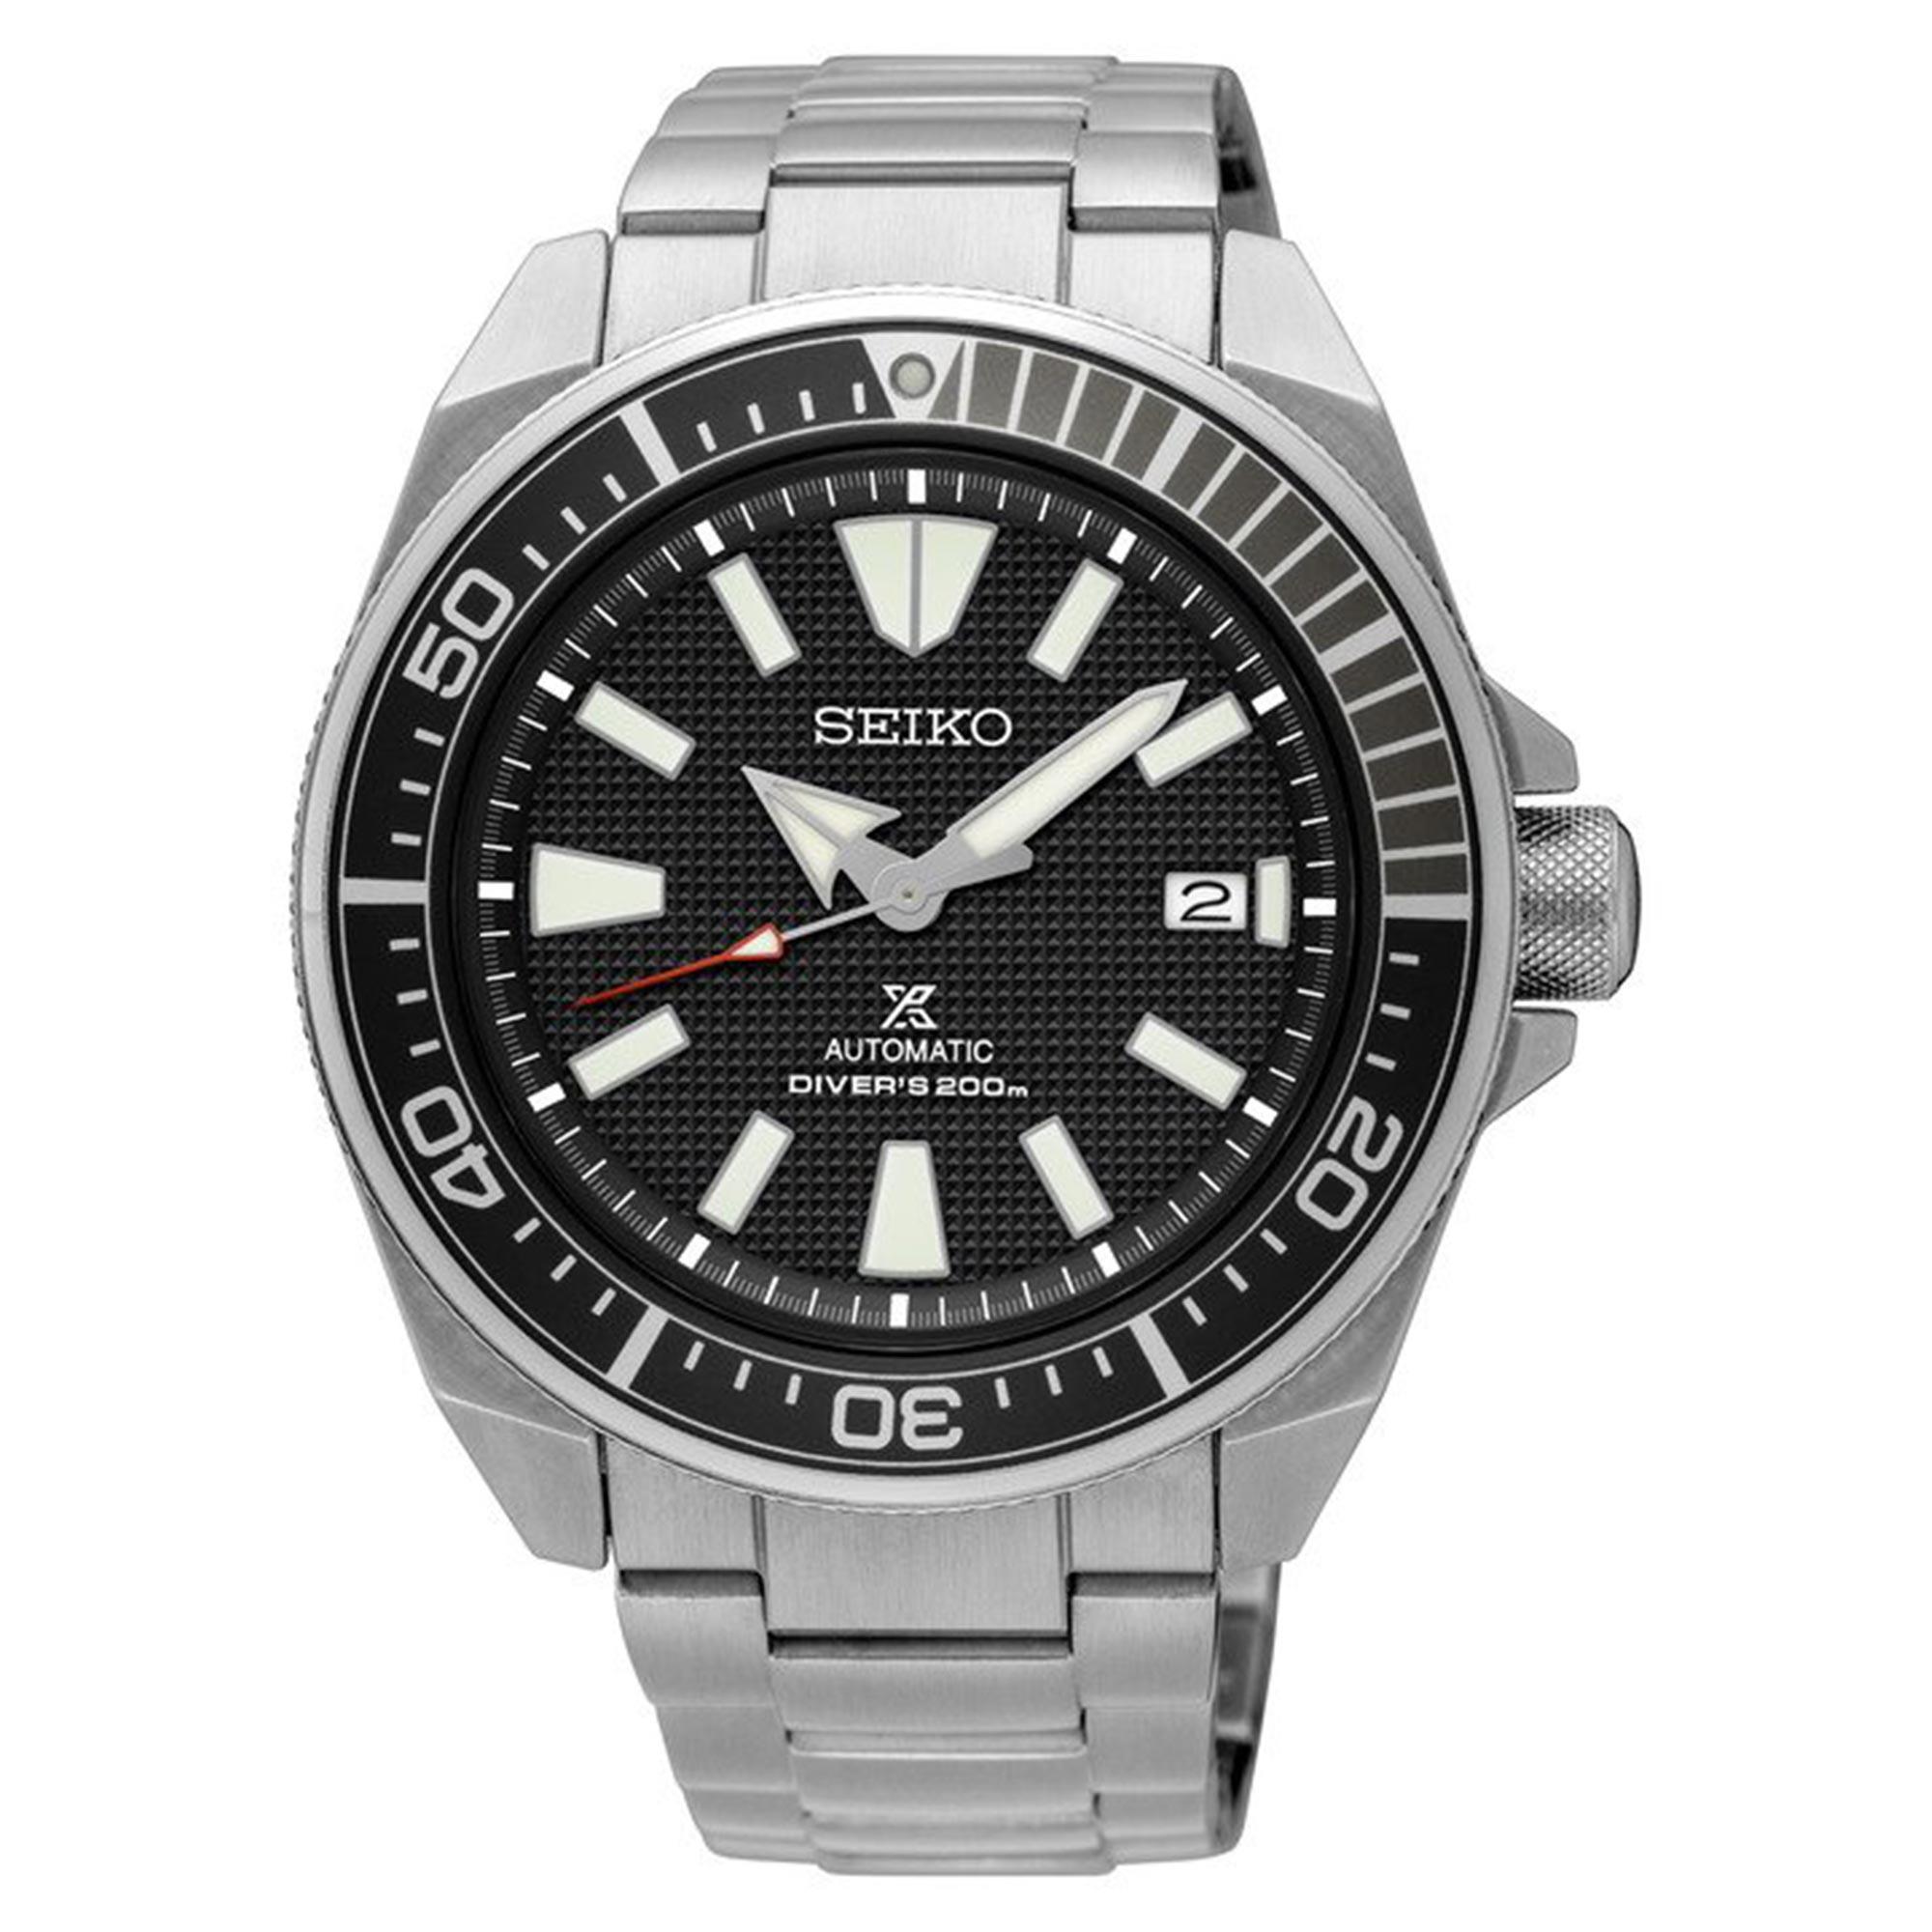 Seiko Prospex Samurai Automatic Black Dial Silver Stainless Steel Diver's Men's Watch SRPB51K1 RRP £399